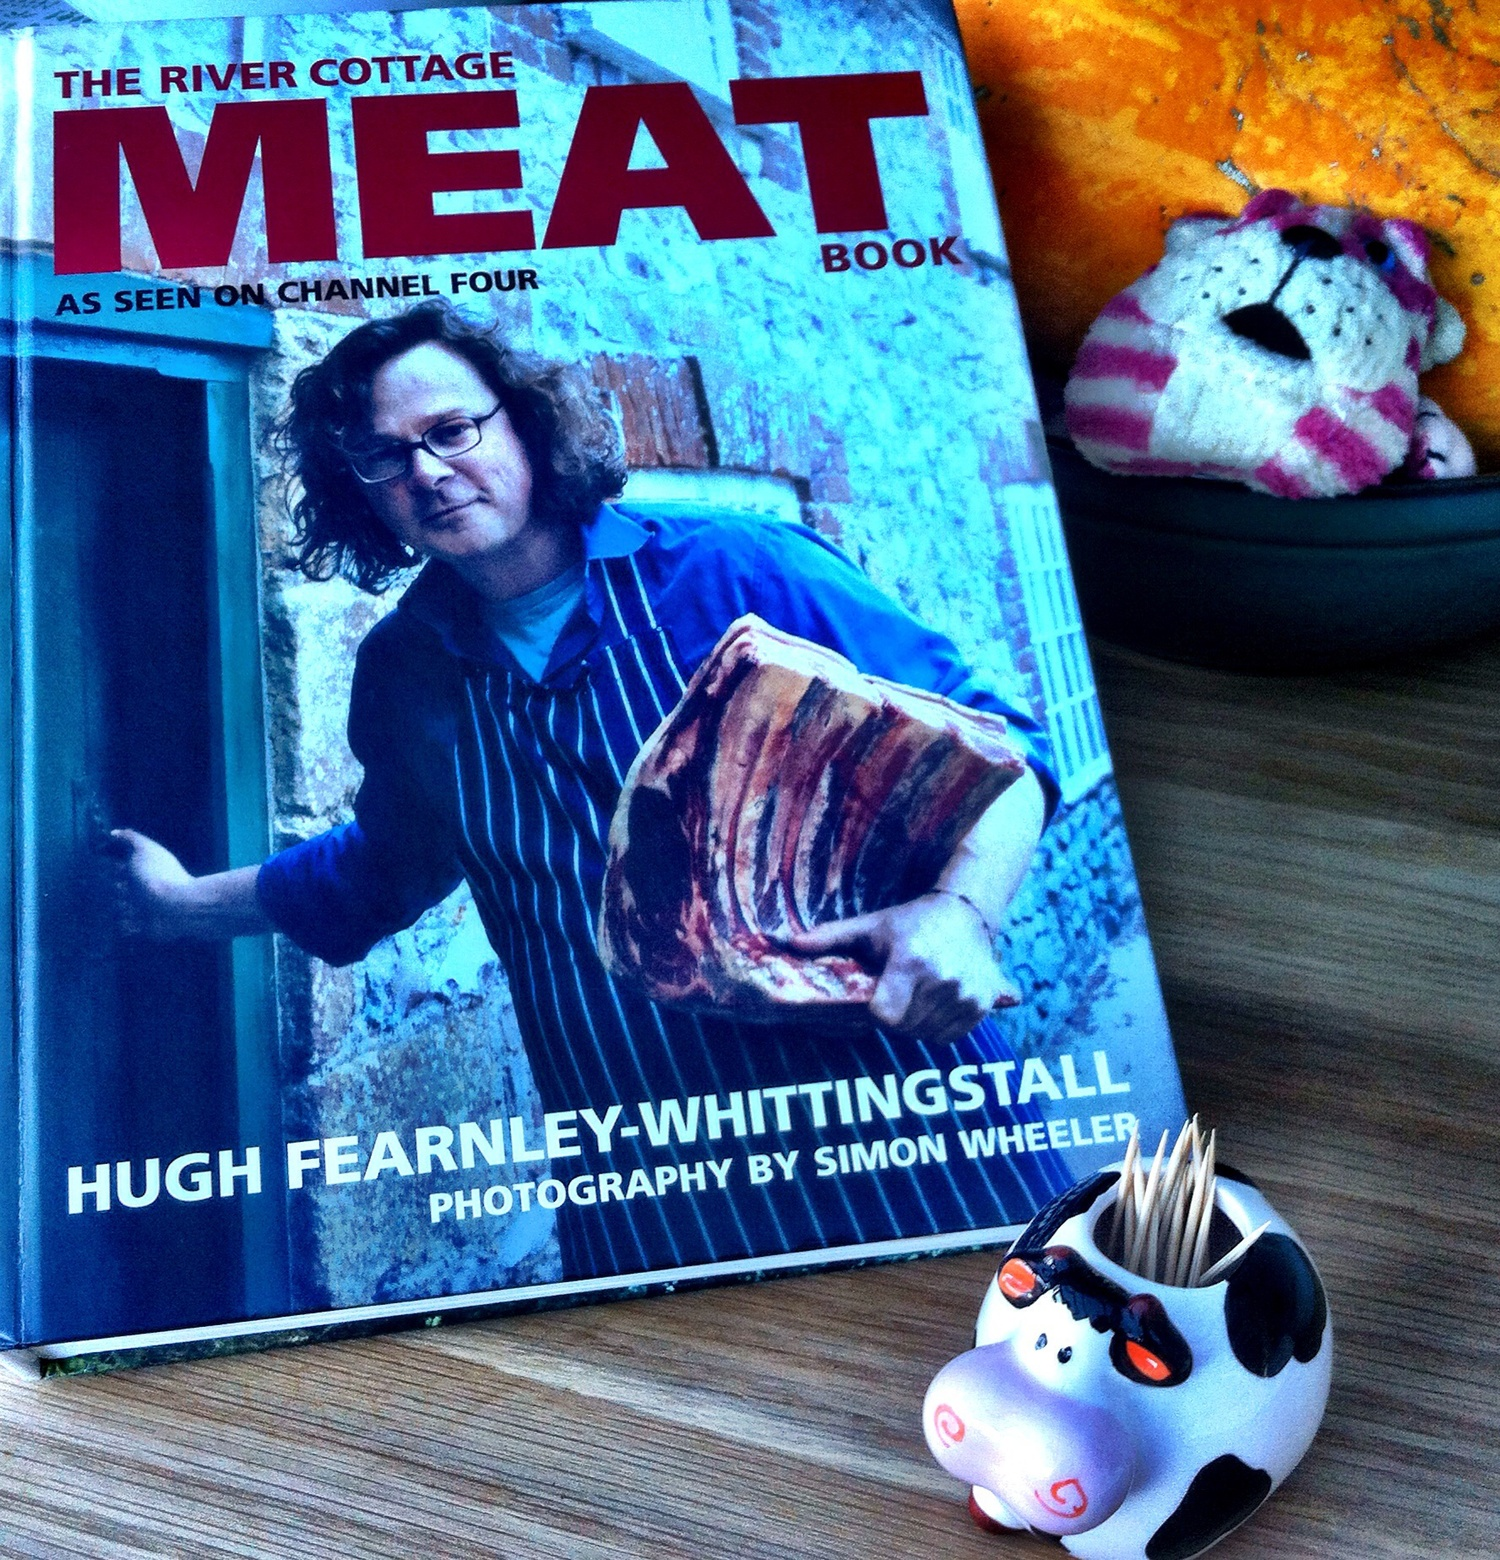 52 Cookbooks 49: Beef stock